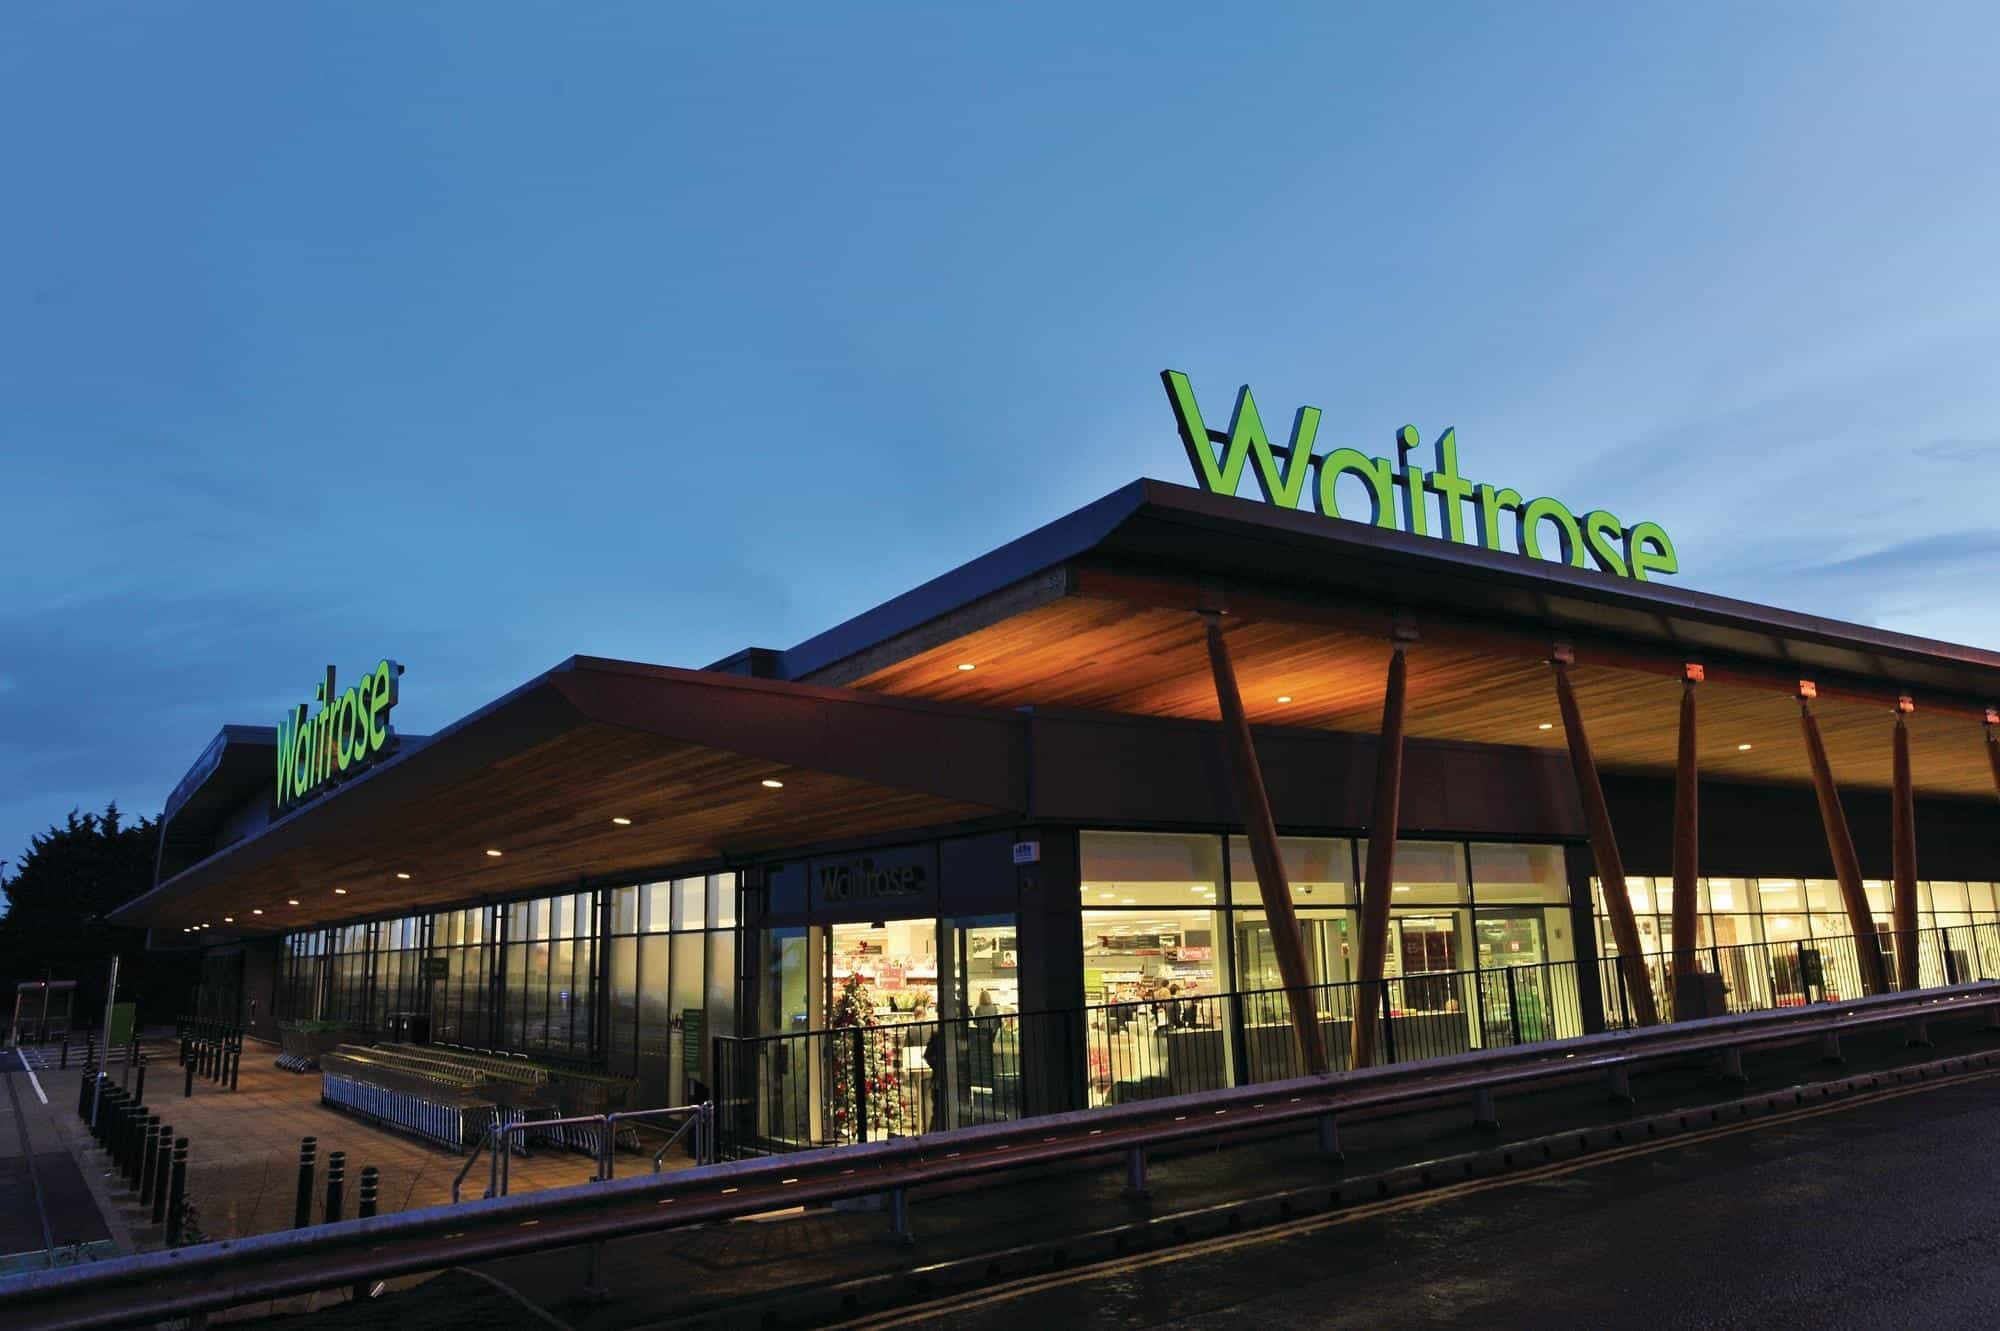 shopping at waitrose bracknell - 247 airport ride